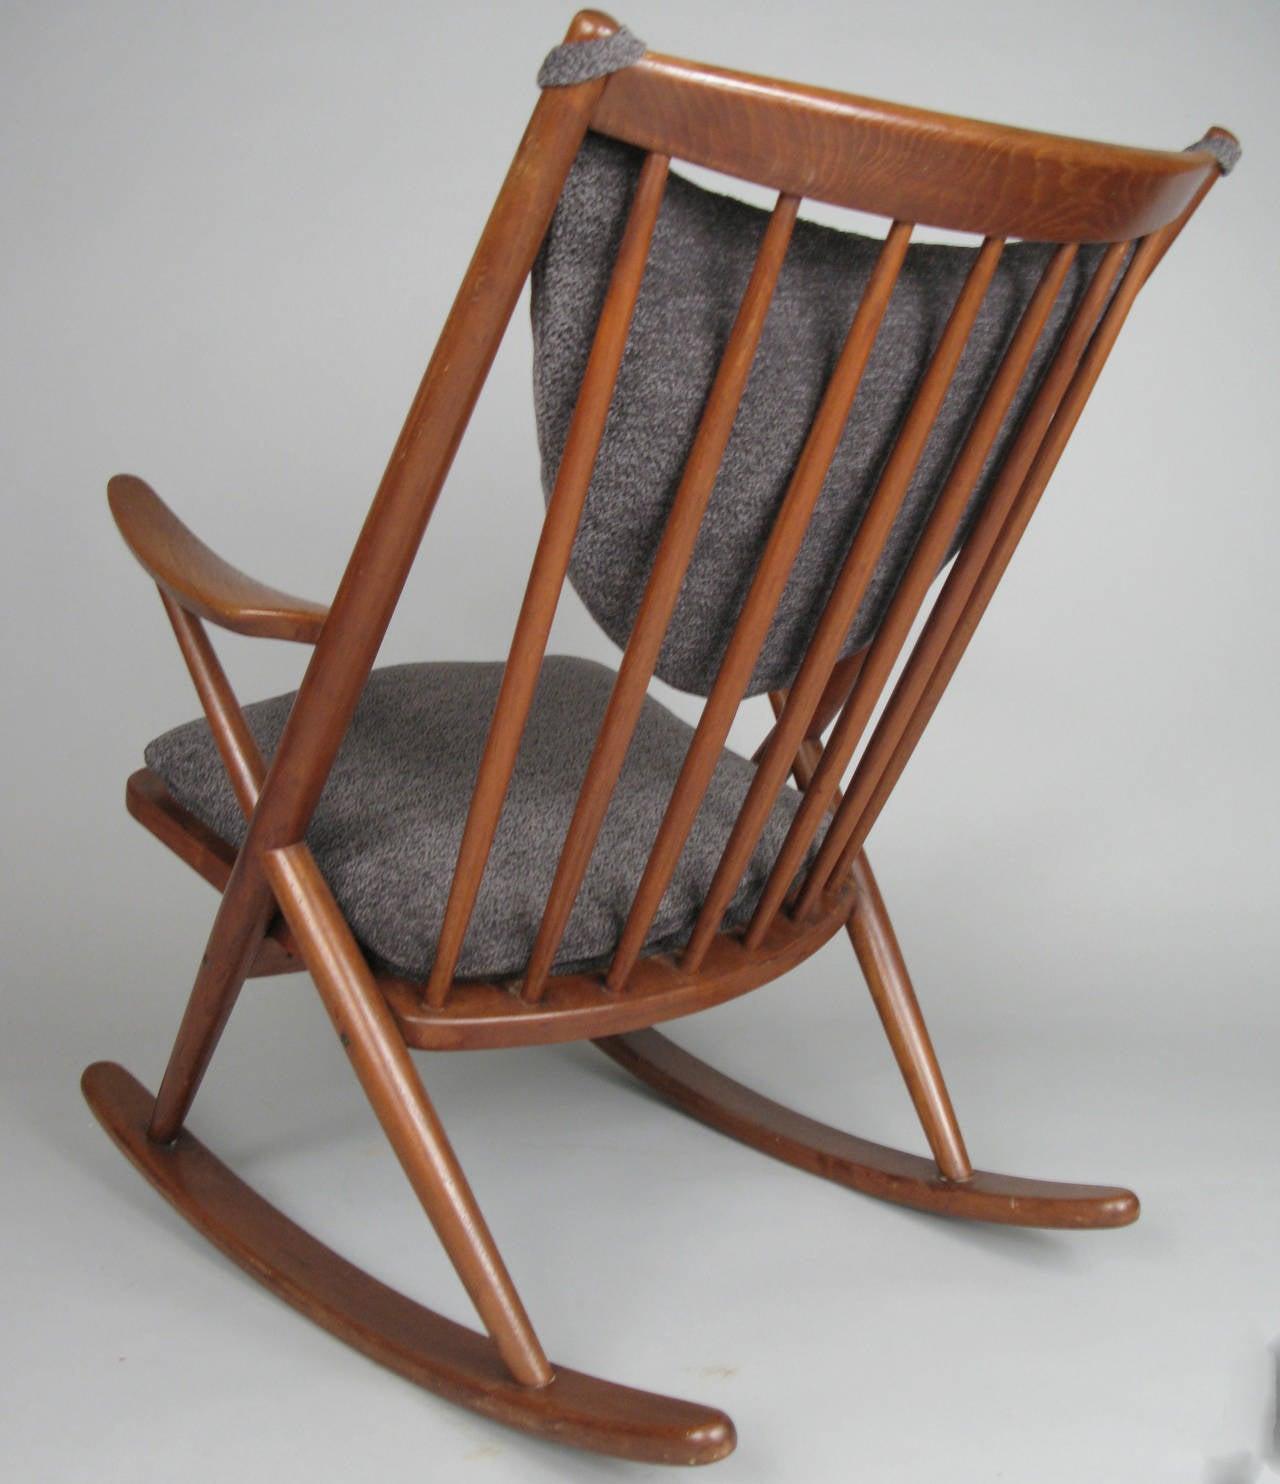 danish modern rocking chair cover hire stoke on trent 1950s teak by frank reenskaug